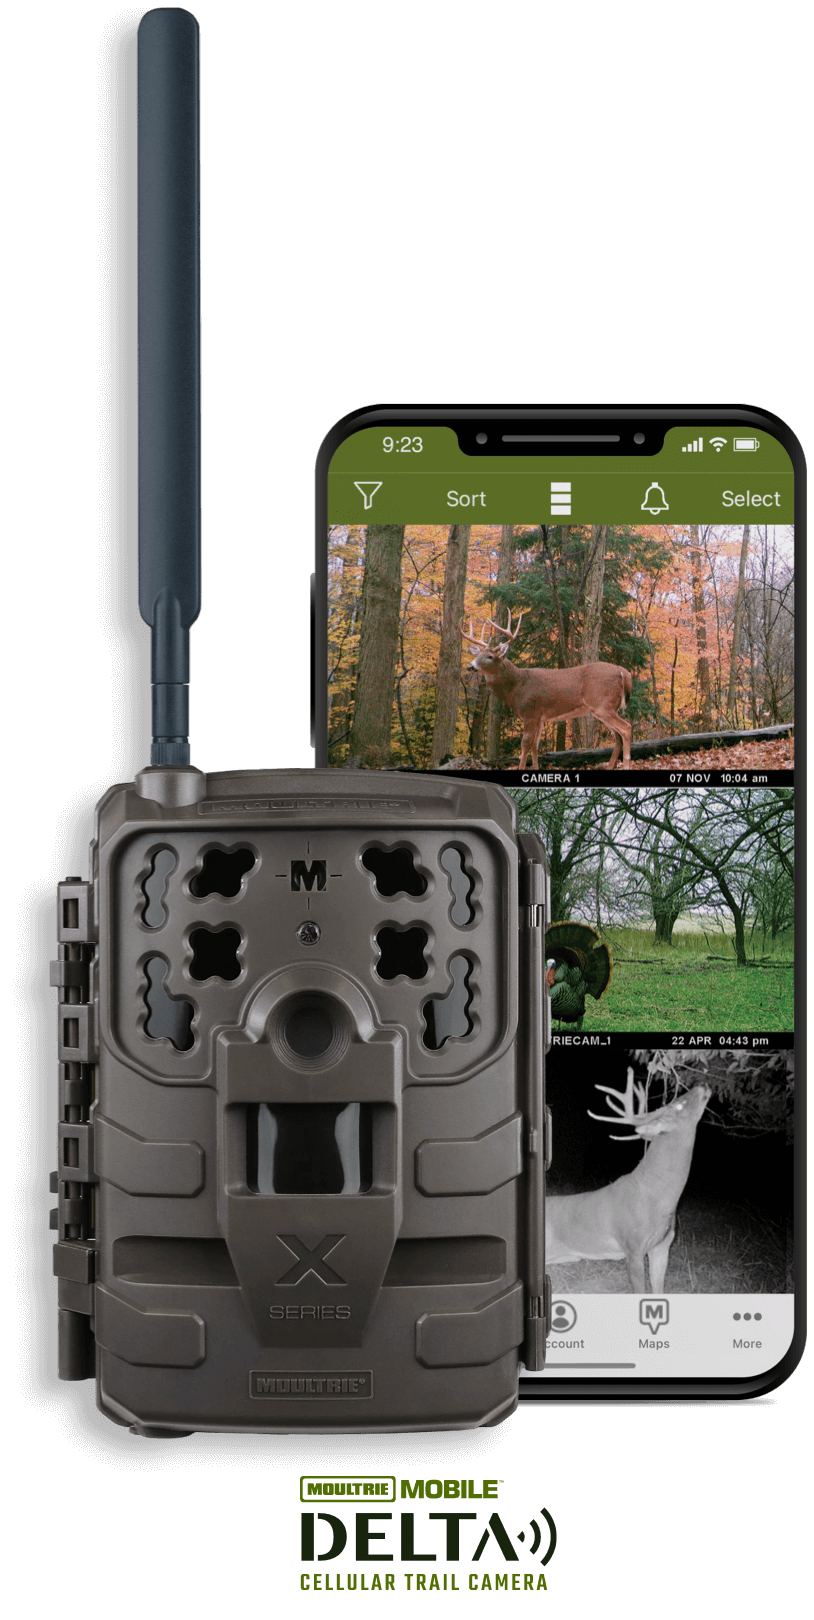 Moultrie Mobile Delta Cellular Trail Camera